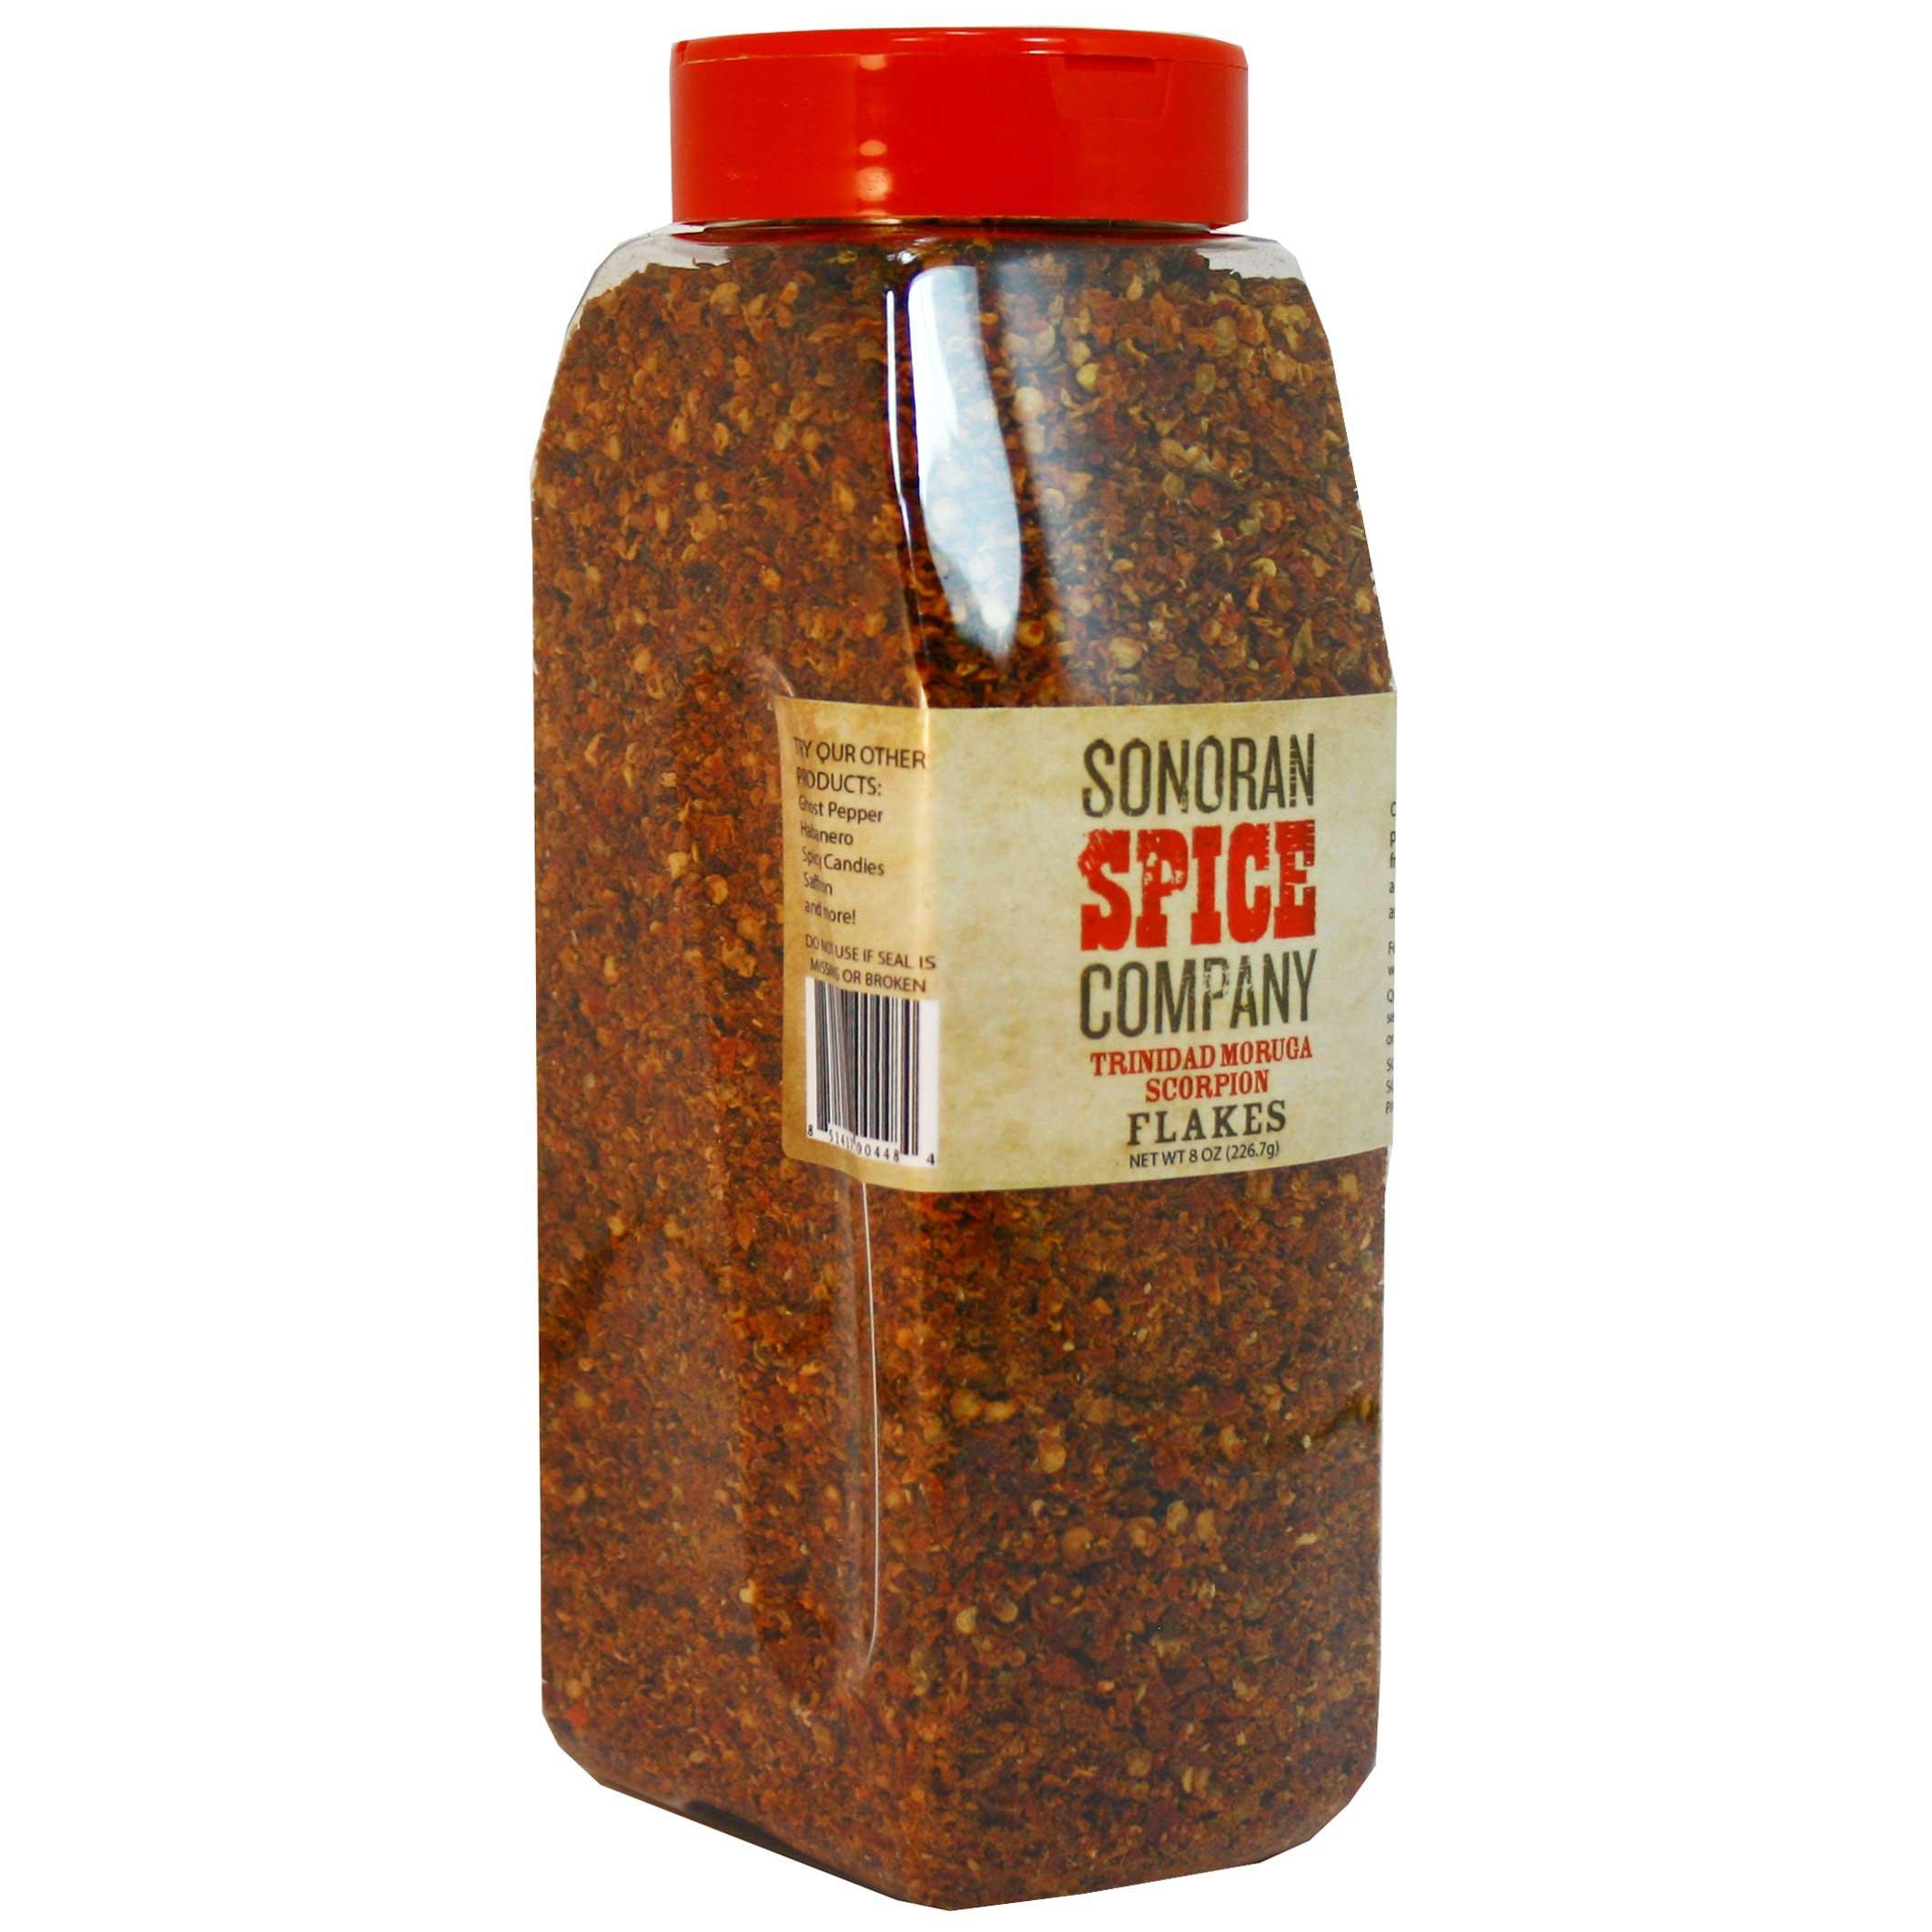 Trinidad Scorpion Flakes (8 Oz)